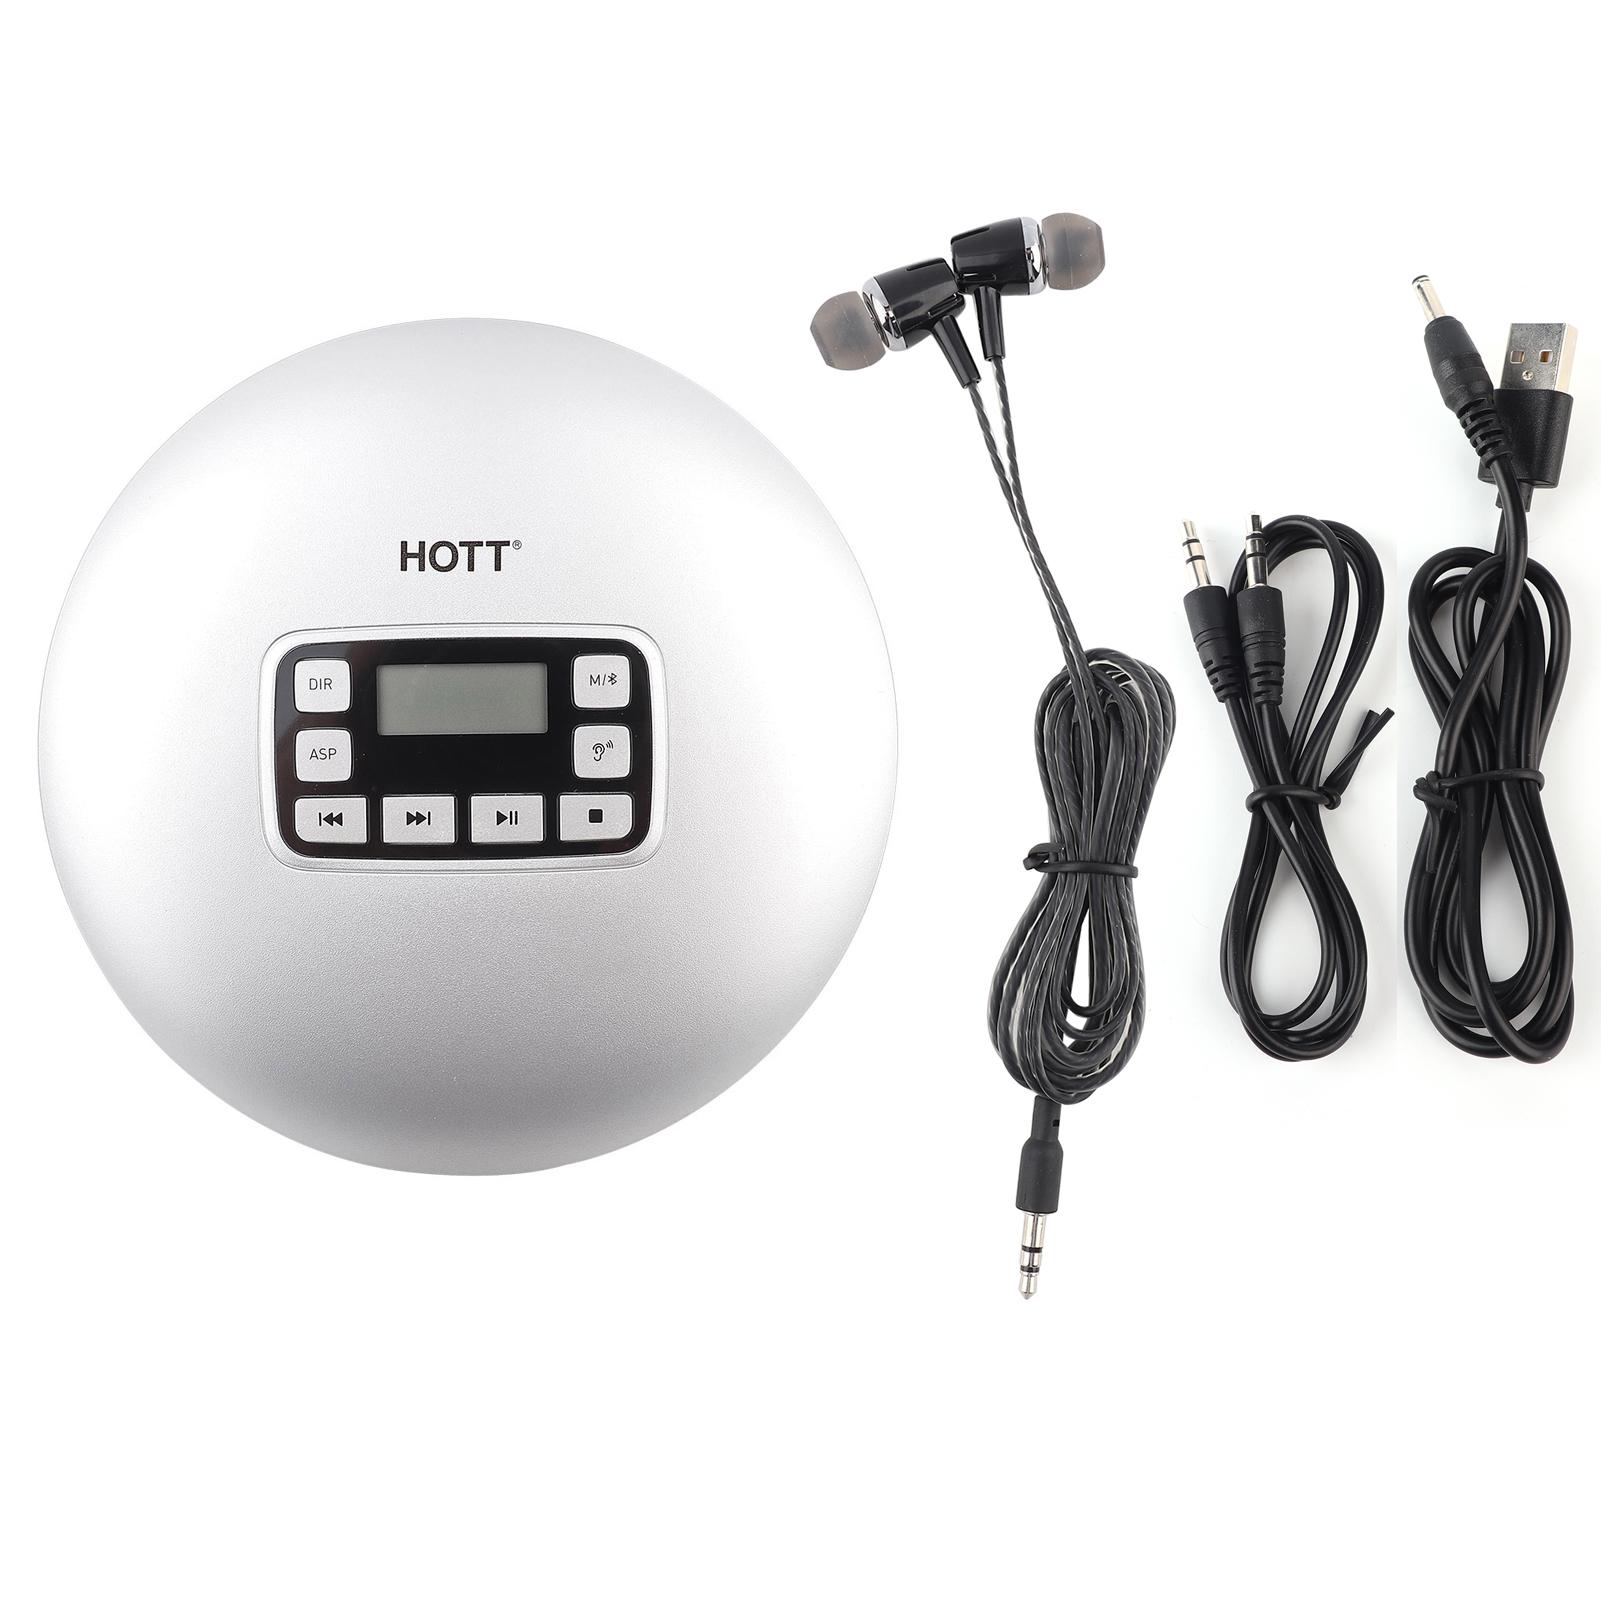 hott hifi mini tragbar cd musik spieler mit led display. Black Bedroom Furniture Sets. Home Design Ideas